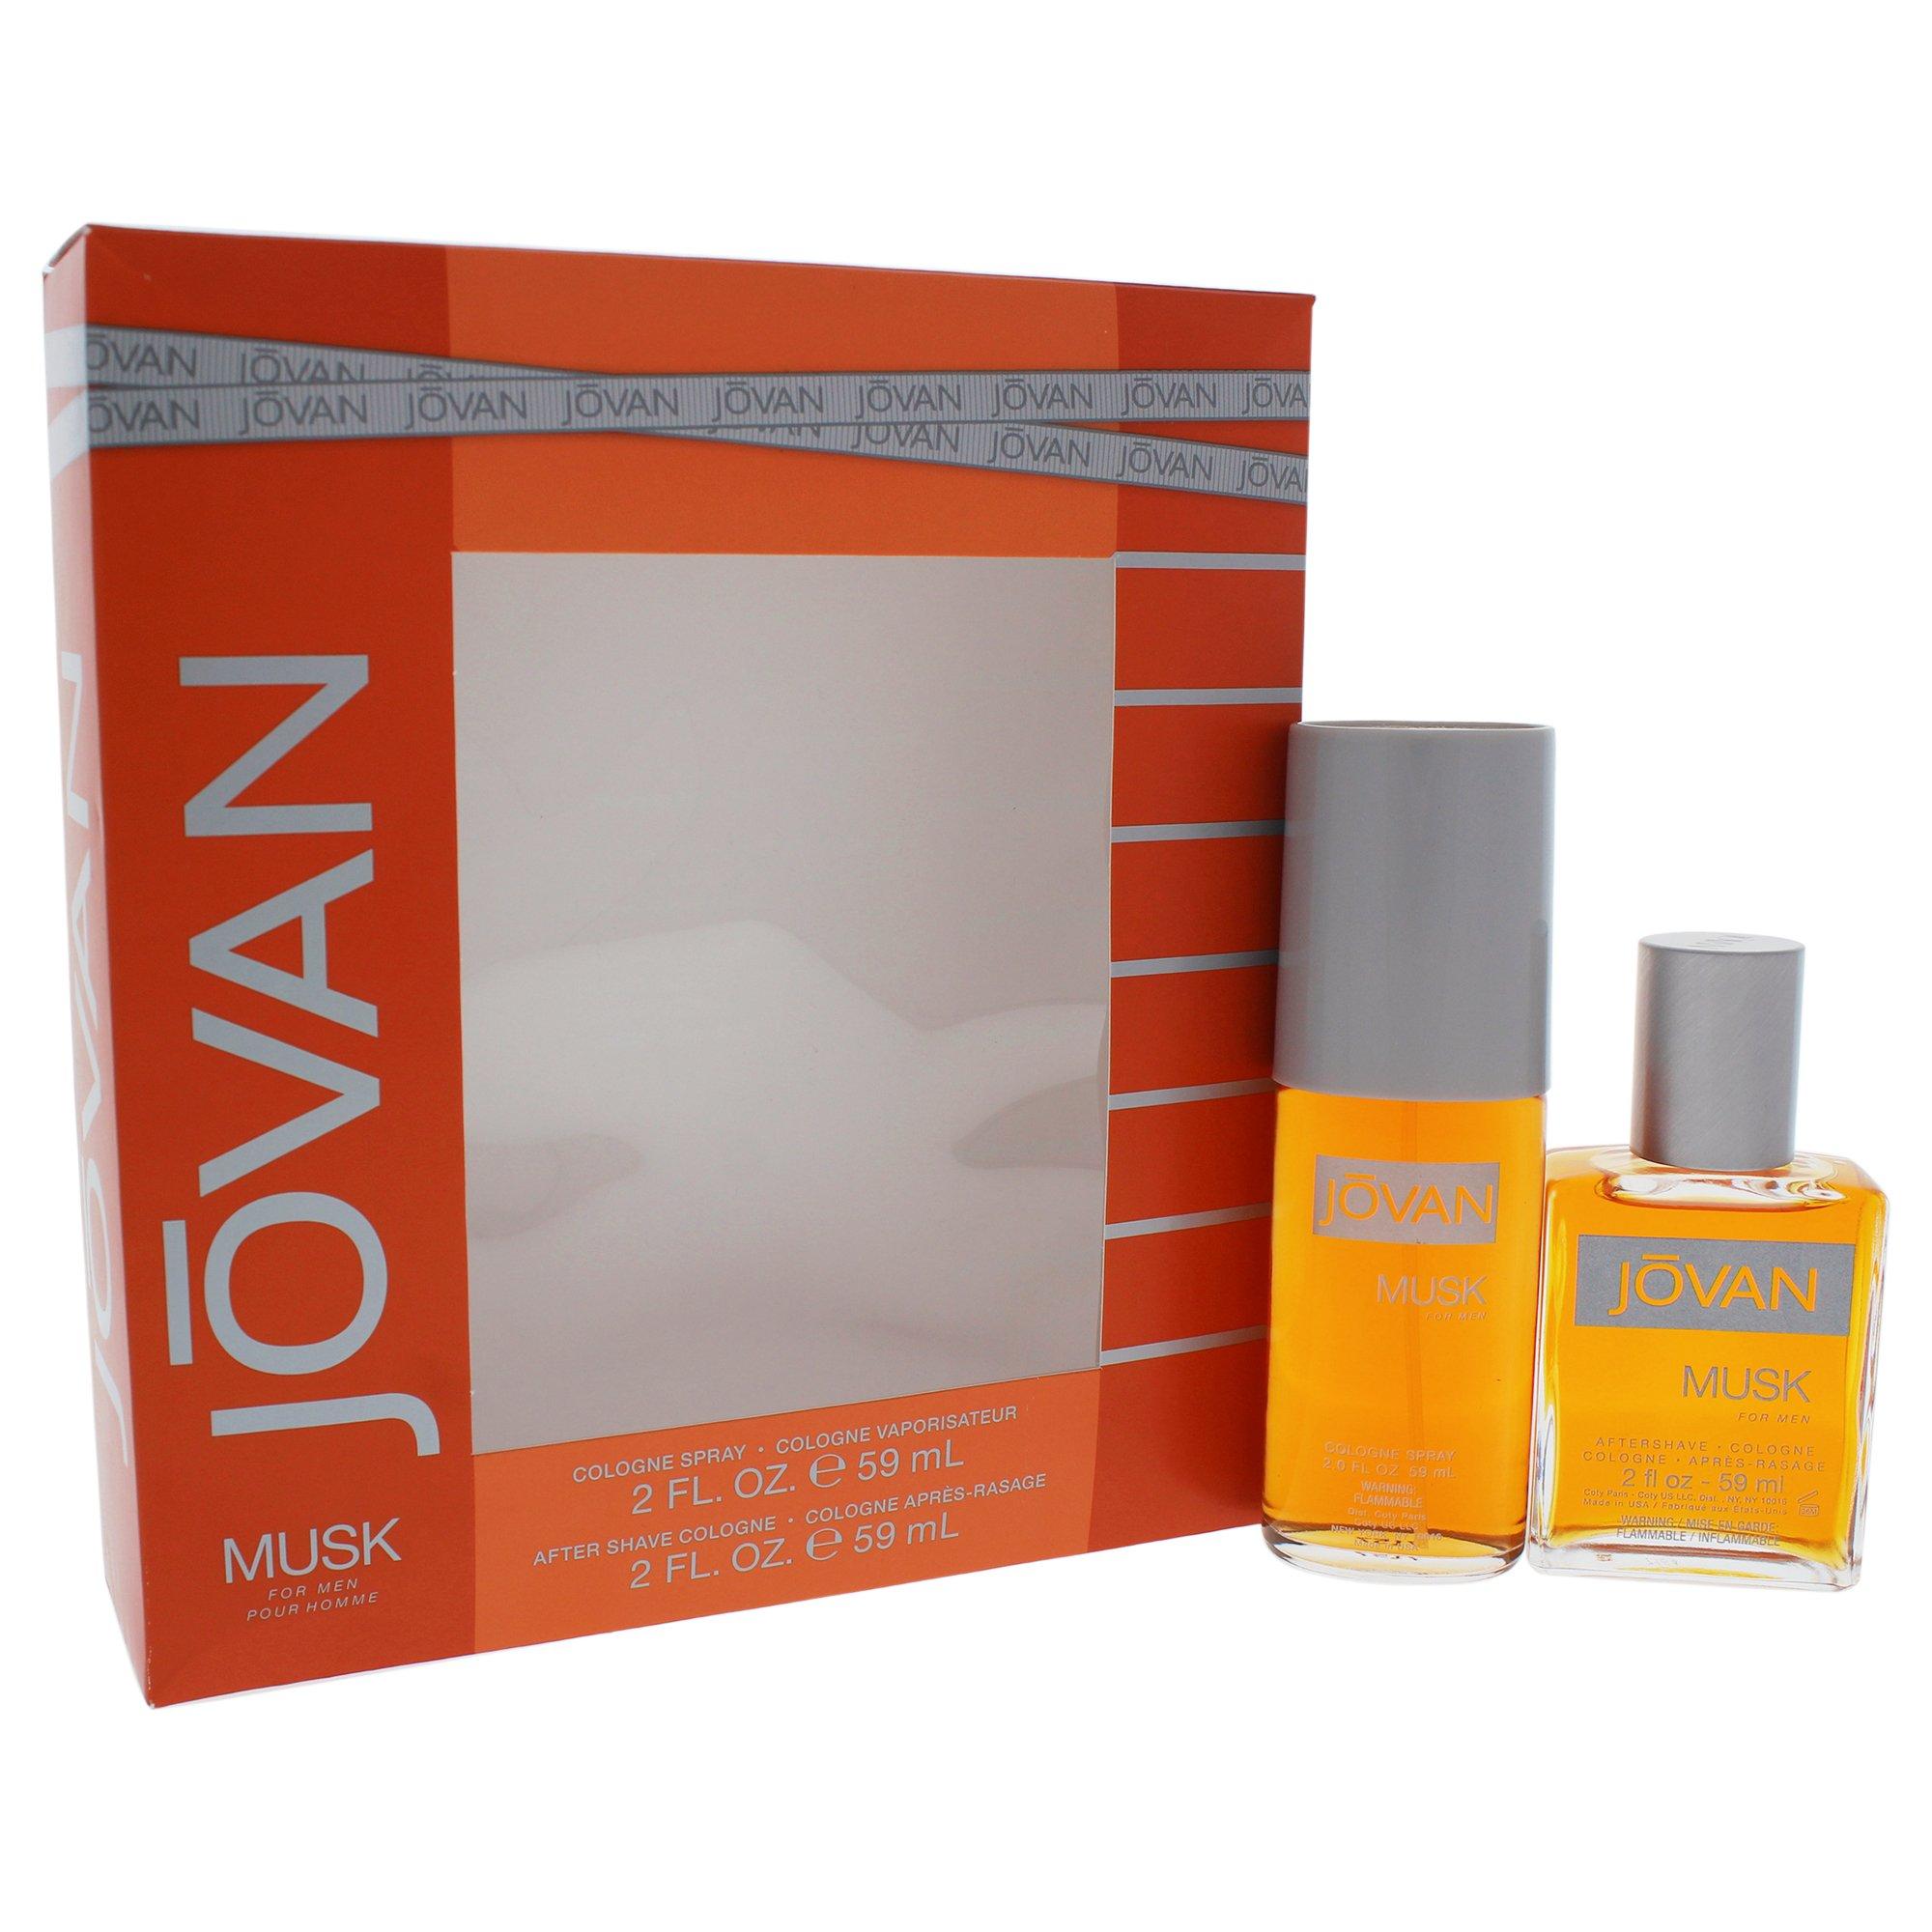 Jovan Men 2pc Set - 2 oz Cologne Spray + 2 oz Aftershave Cologne by Jovan